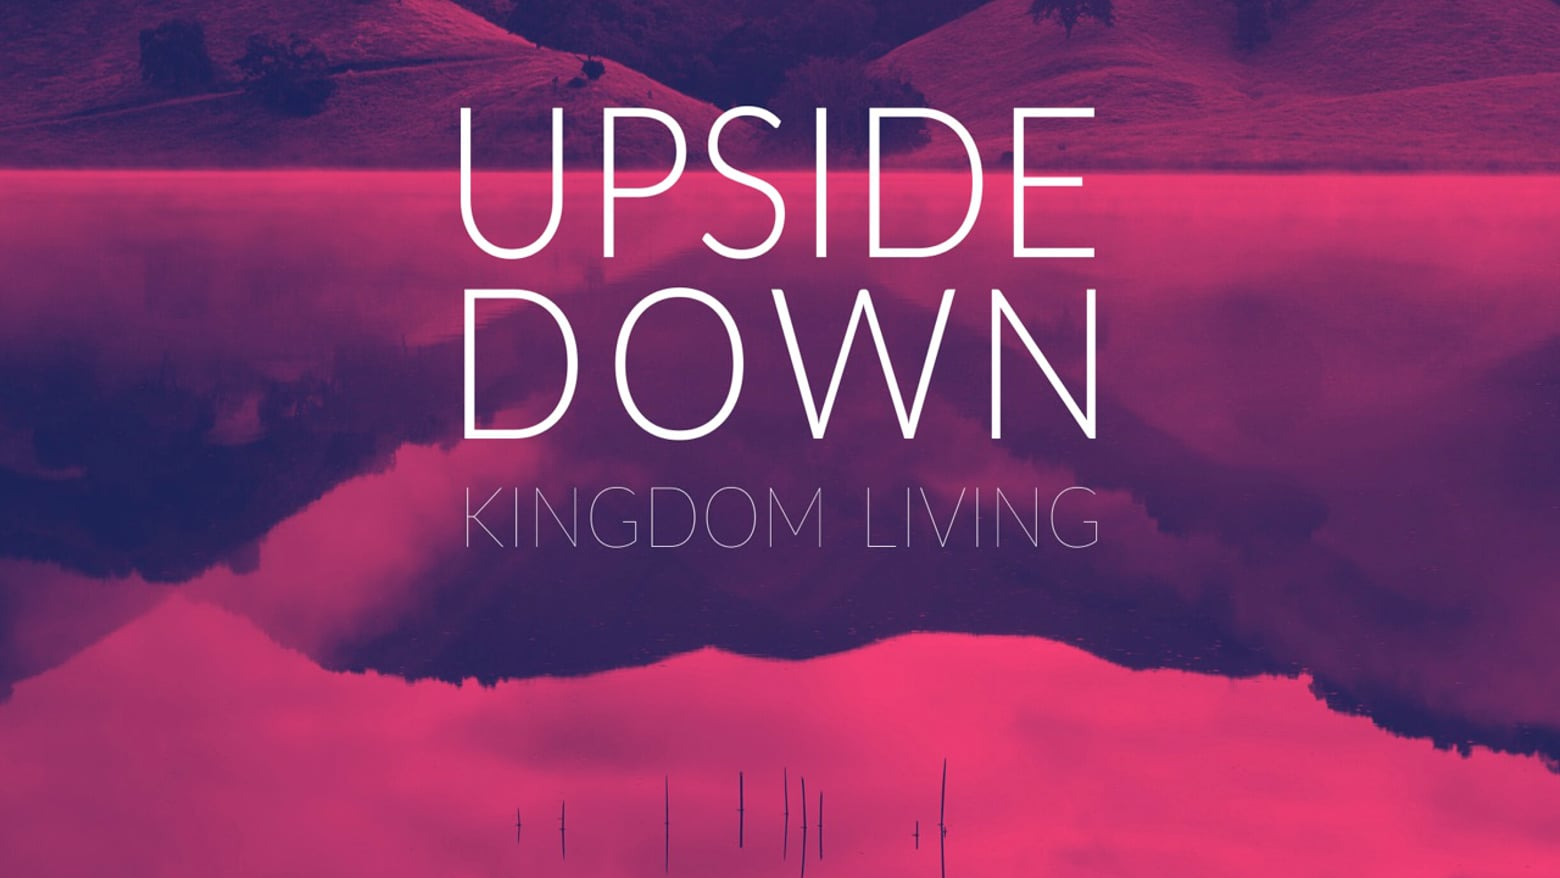 Upside Down Kingdom Living // Matthew 5:1-12